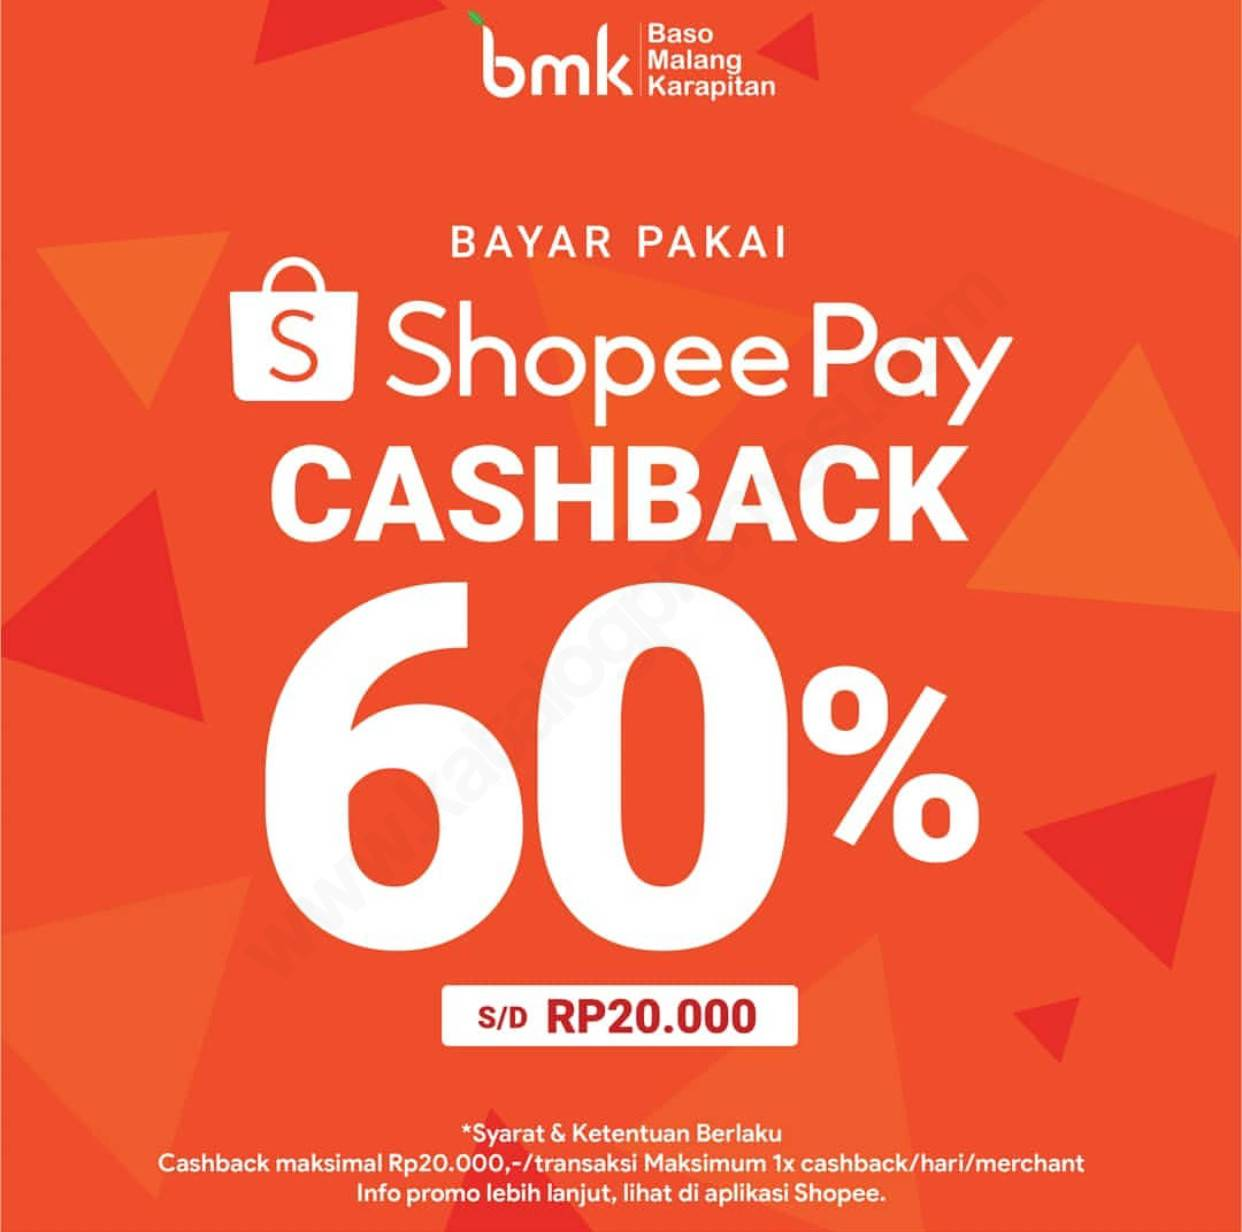 BMK Baso Malang Karapitan Promo Cashback 60% dengan ShopeePay